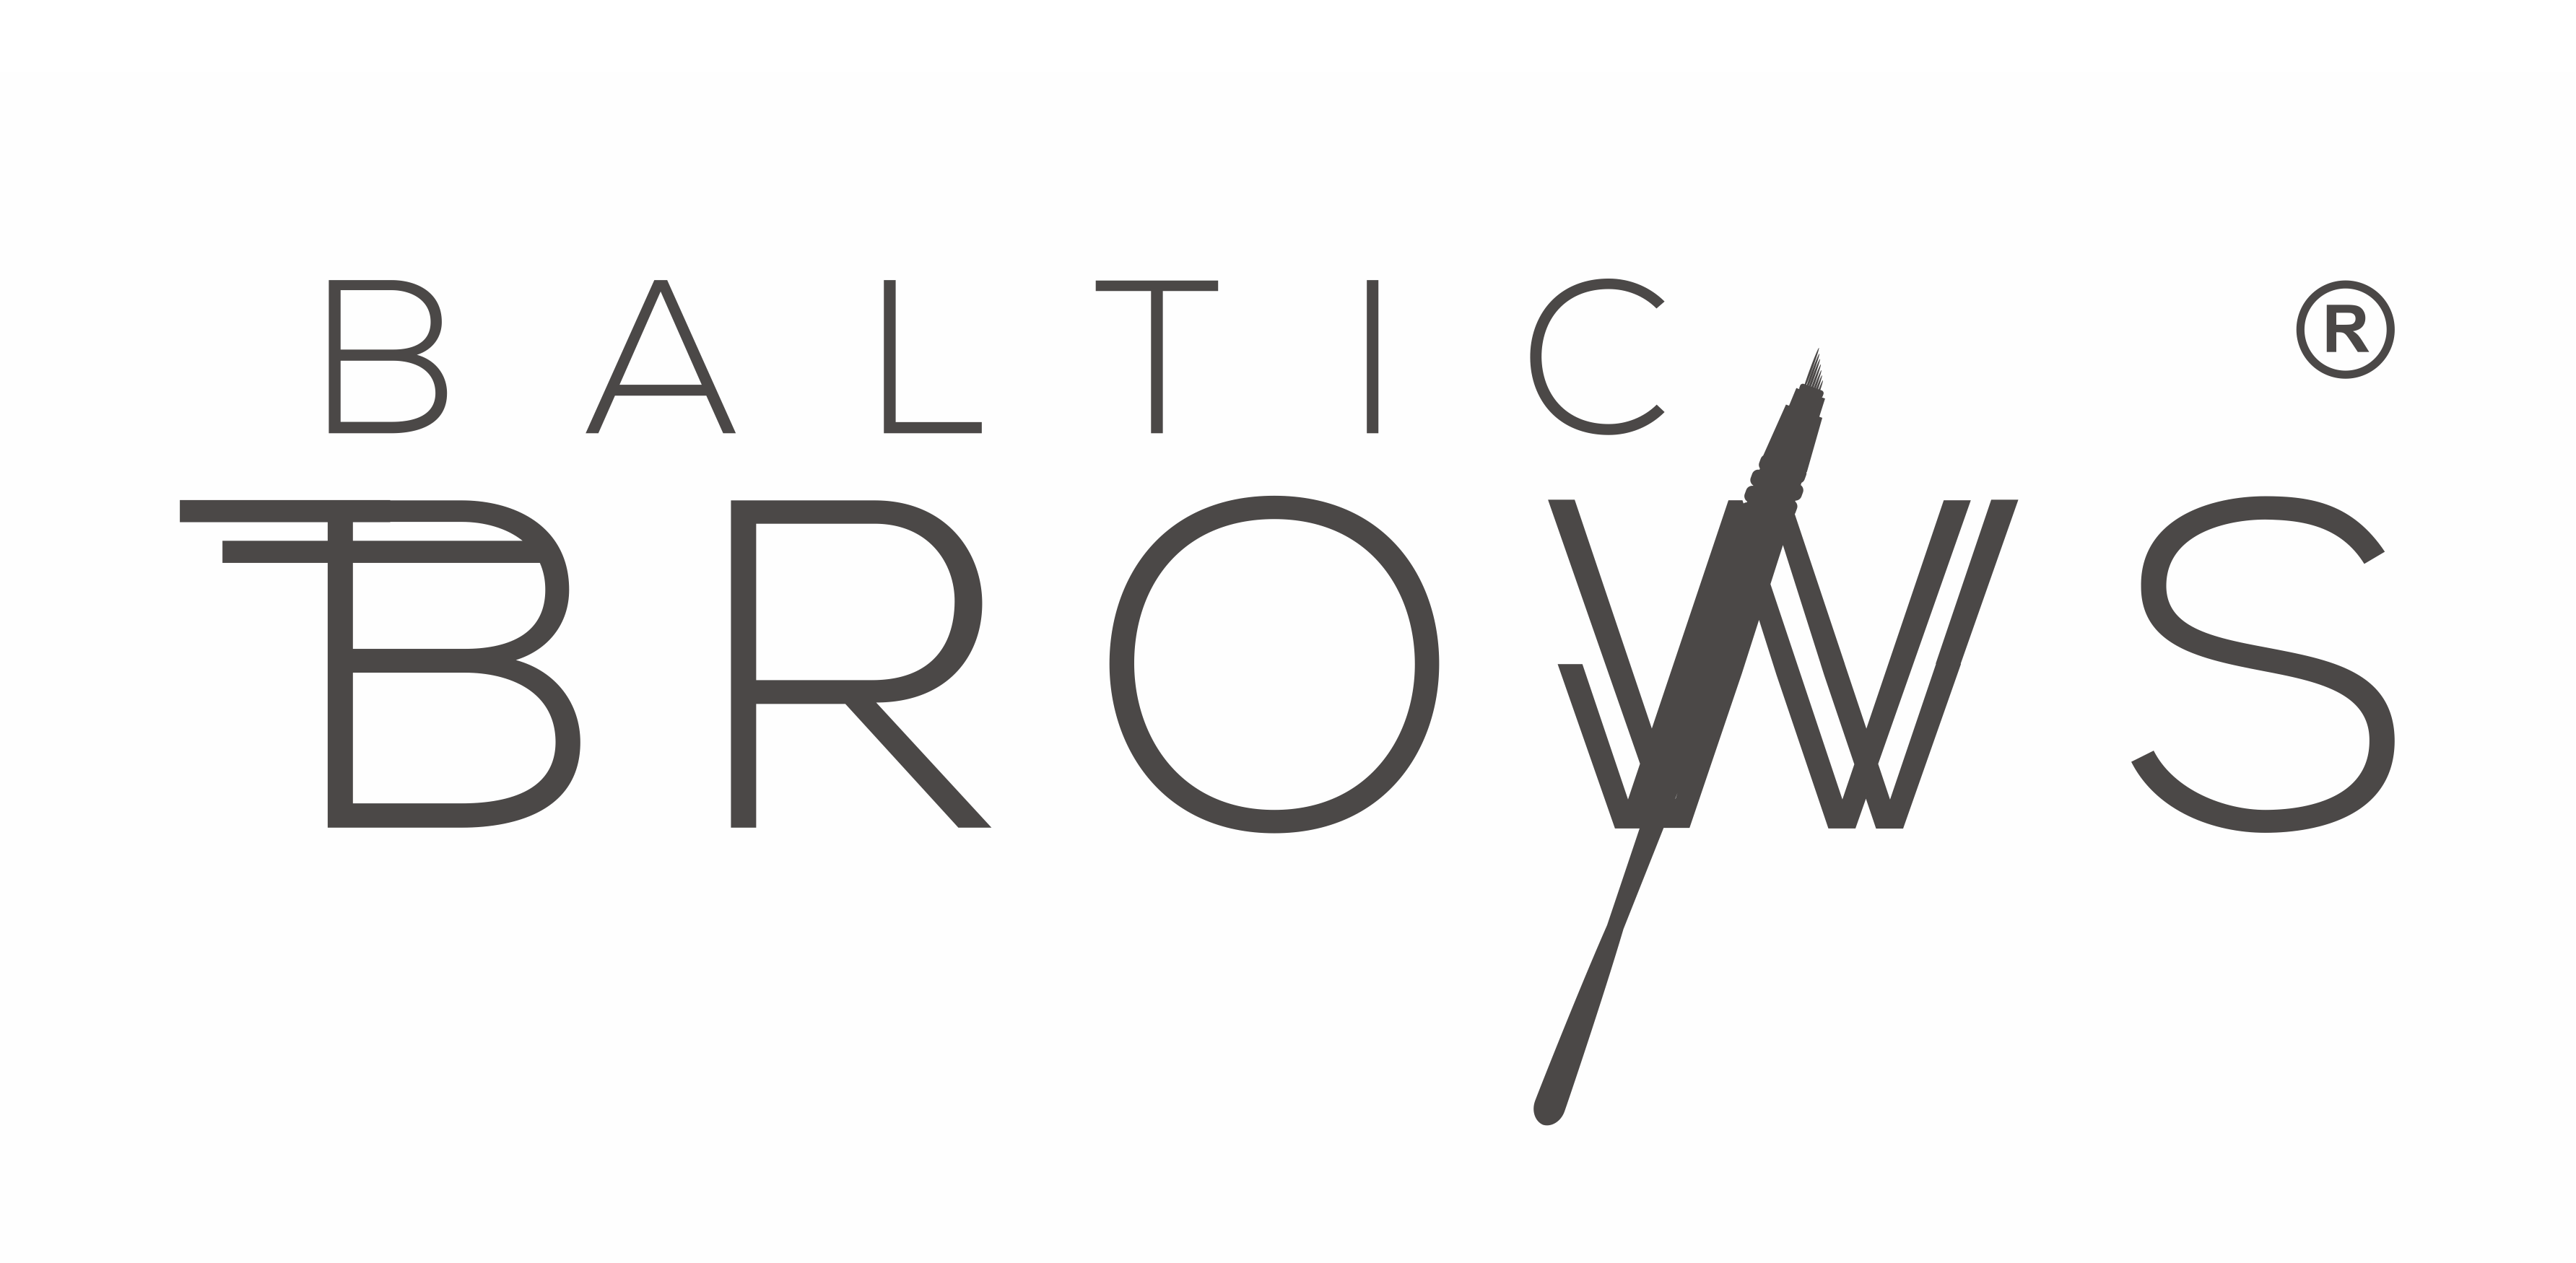 shopbalticbrows.com